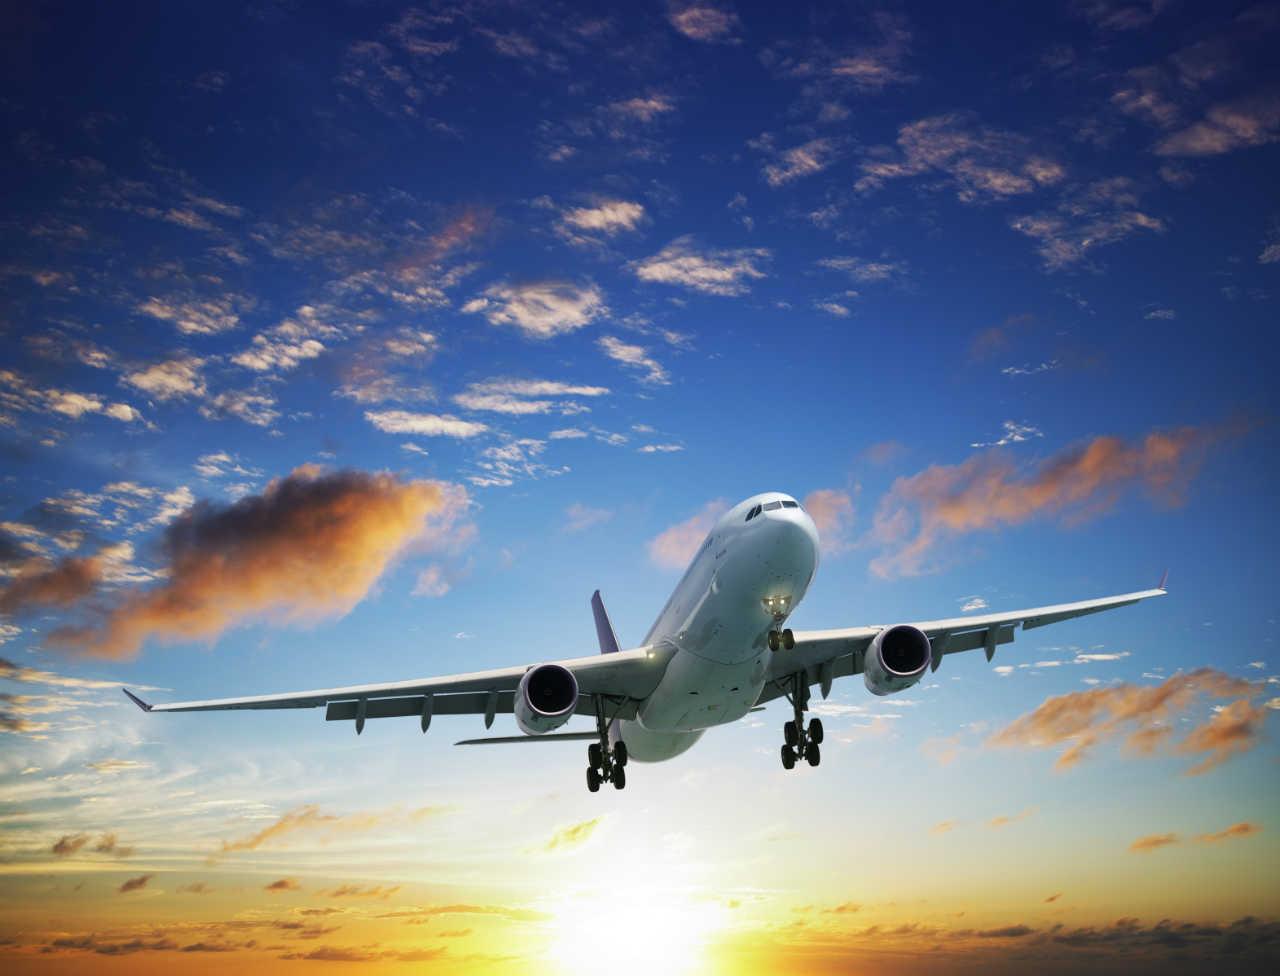 avion-mieux-vaut-reserver-ni-trop-tot-ni-trop-tard-1446588756.jpg